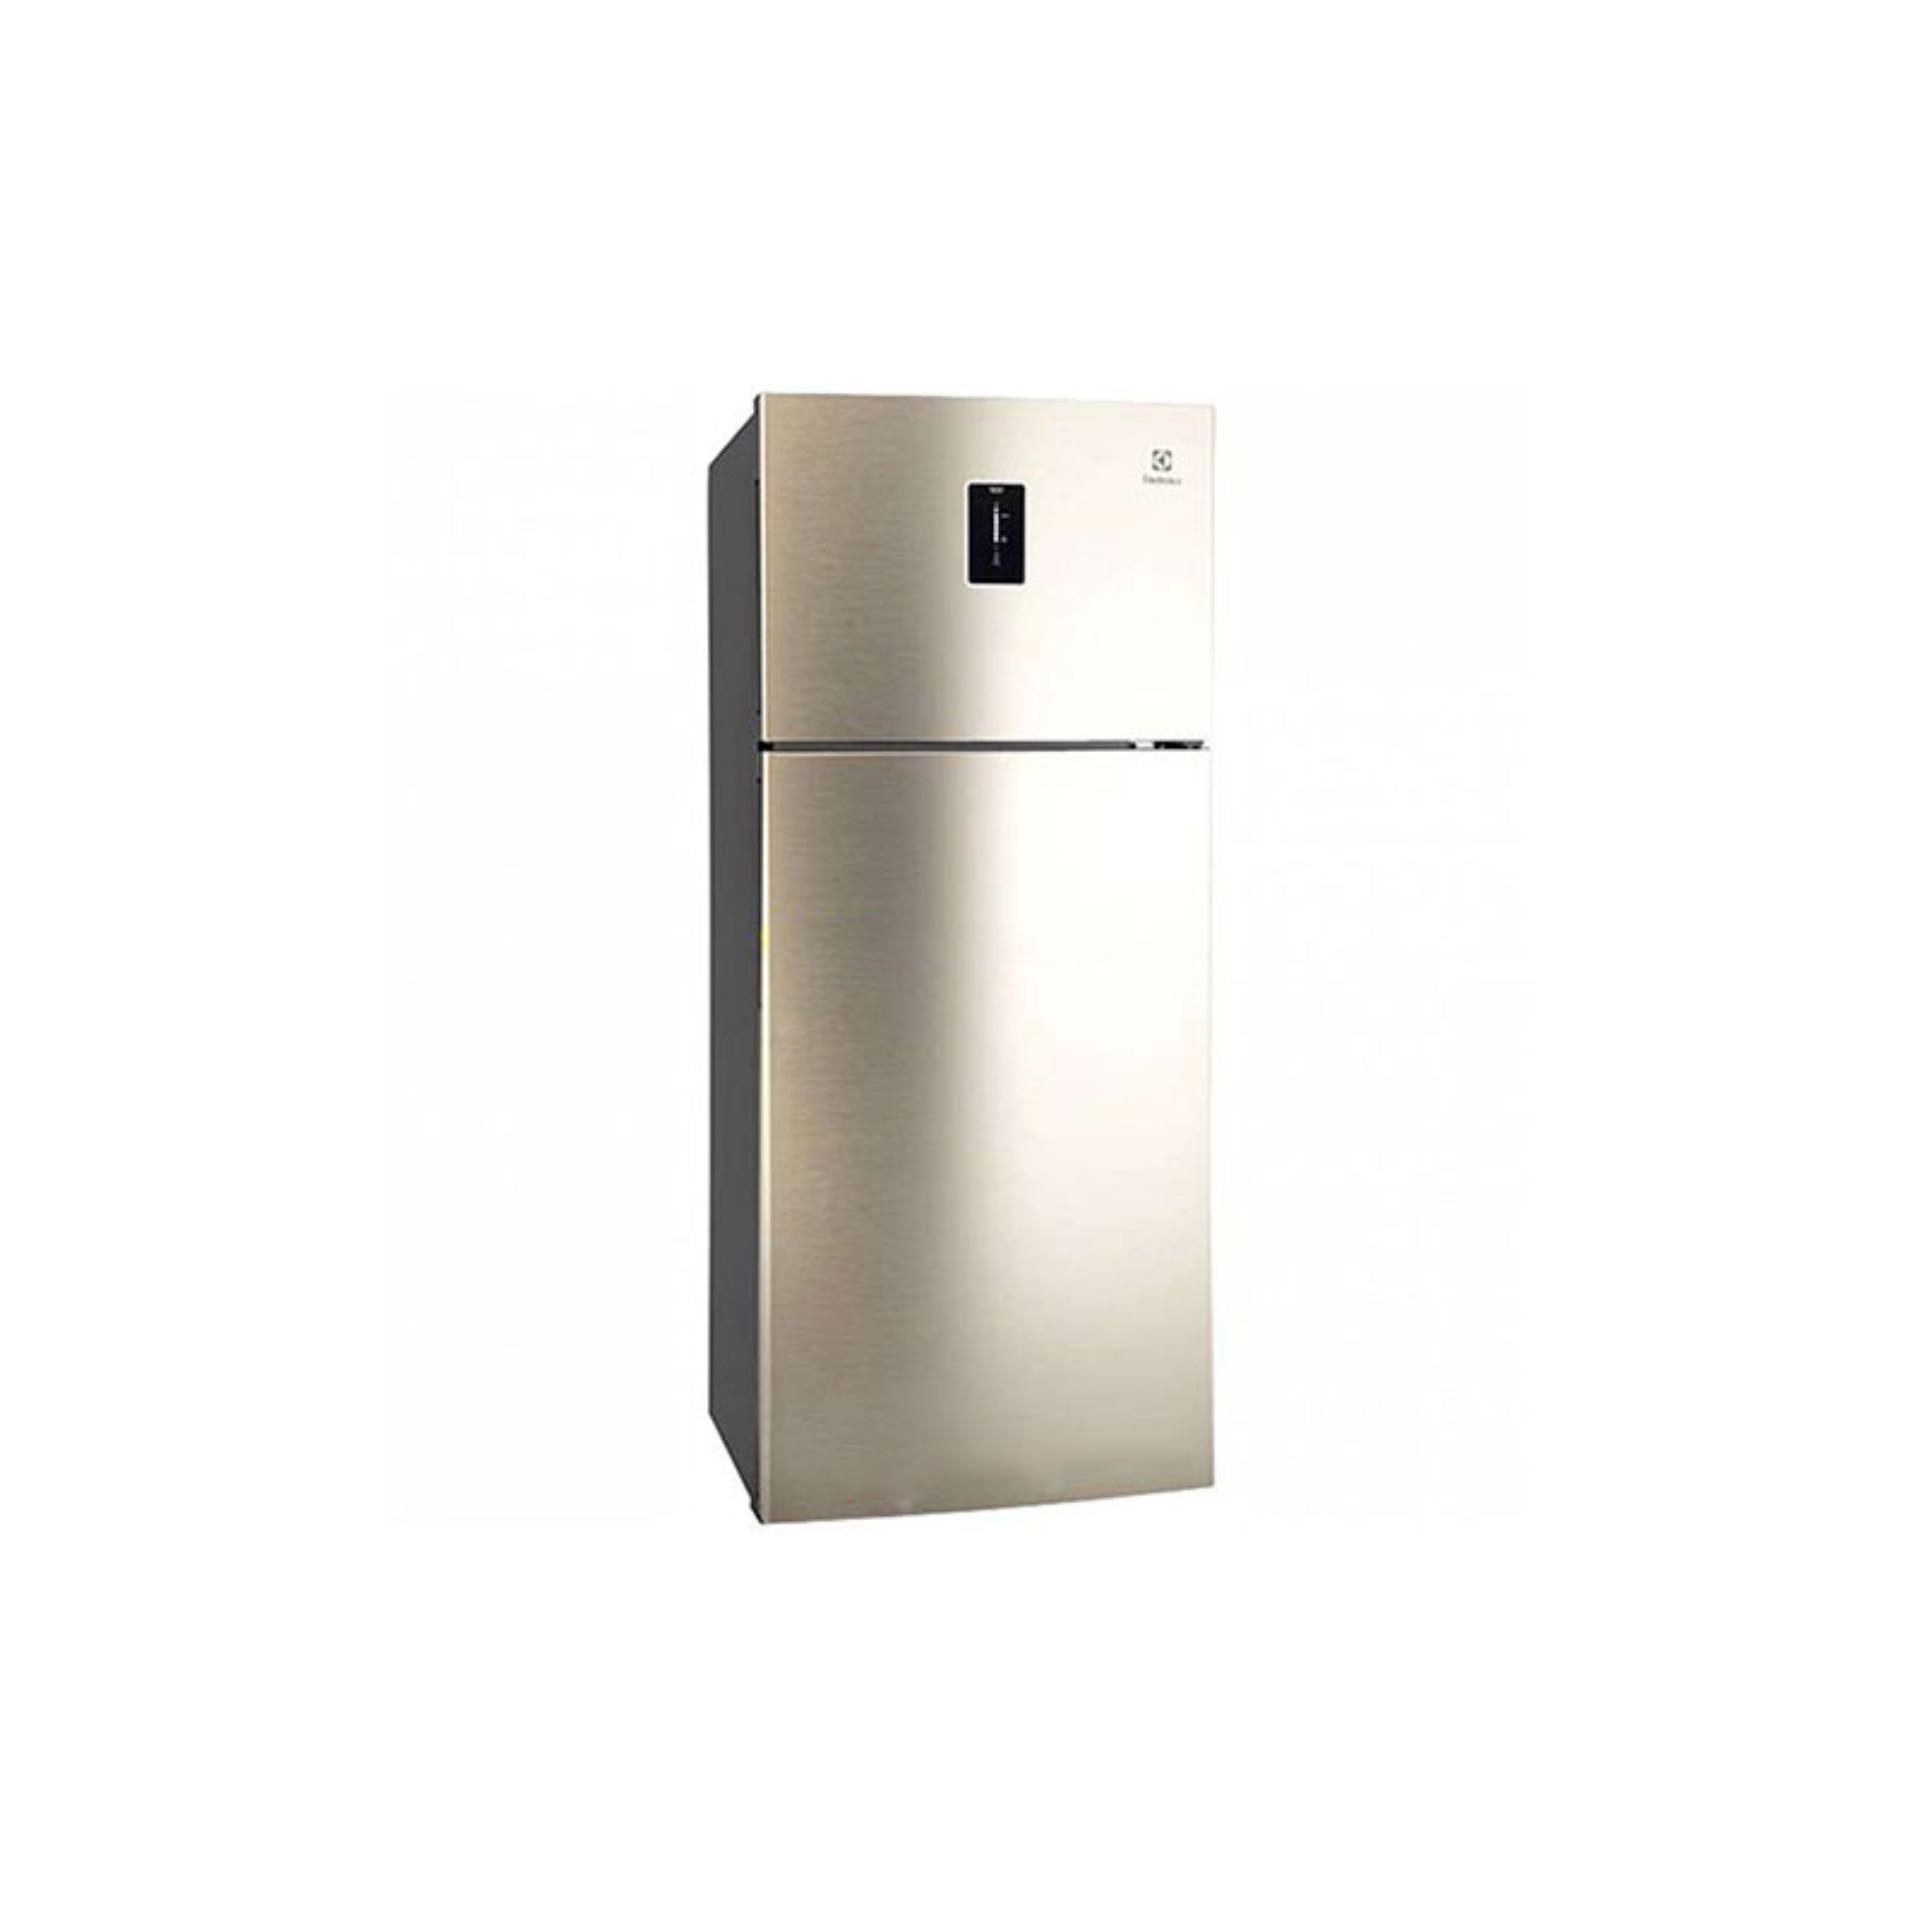 Tủ lạnh Electrolux ETB4602GA